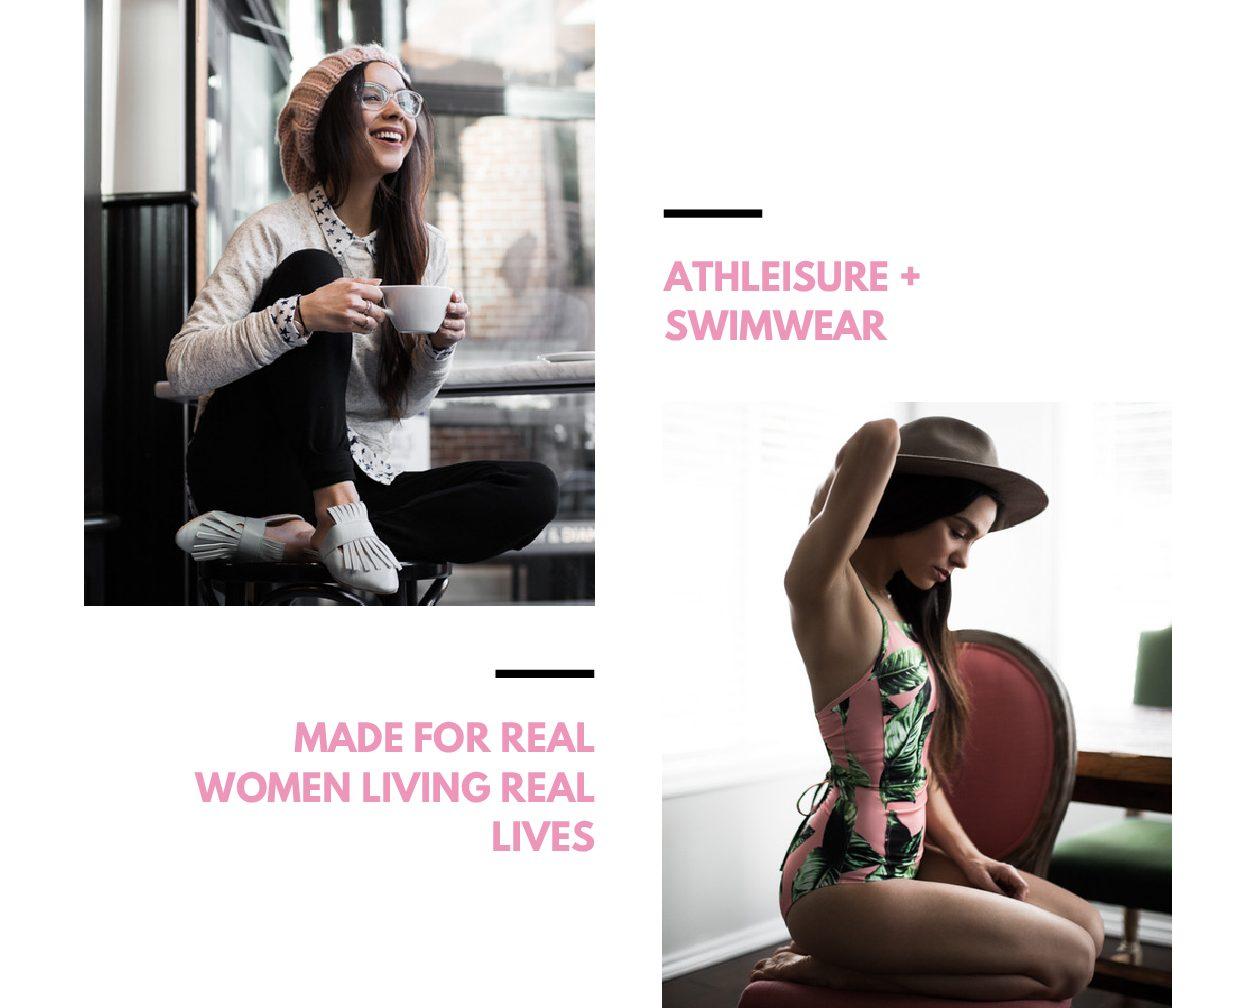 Athleisure + Swimwear with Albion